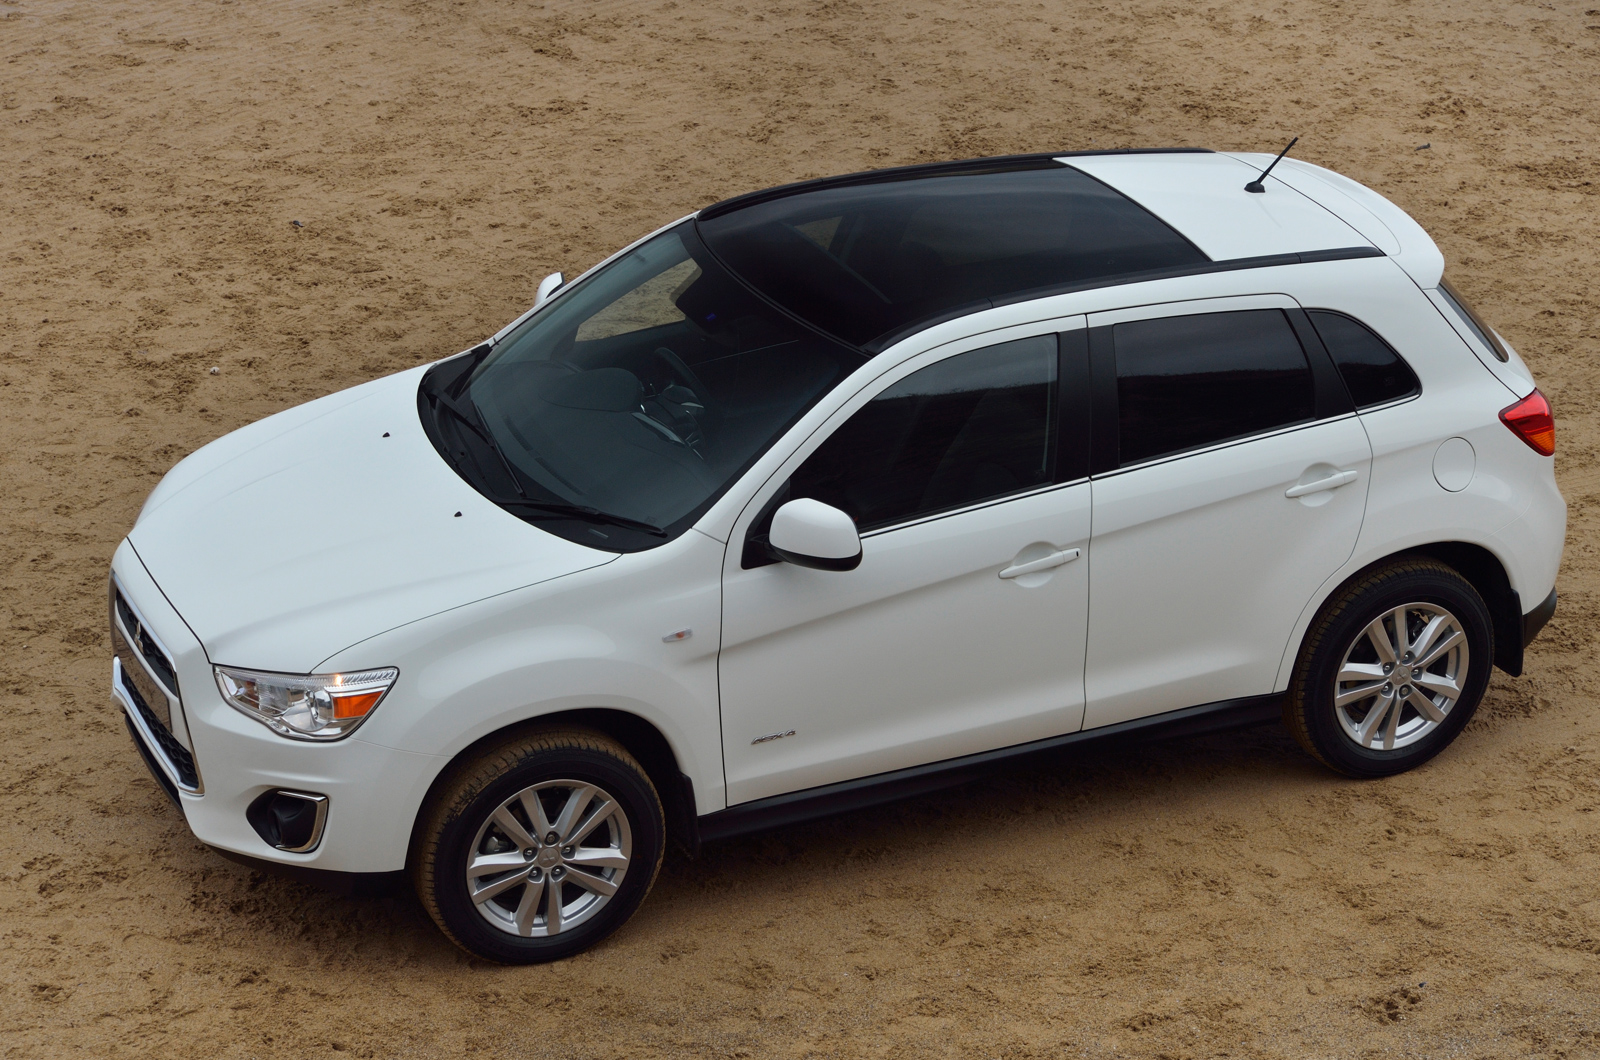 2014 Mitsubishi ASX 2.2 Di-D Diesel 4WD Automatic First